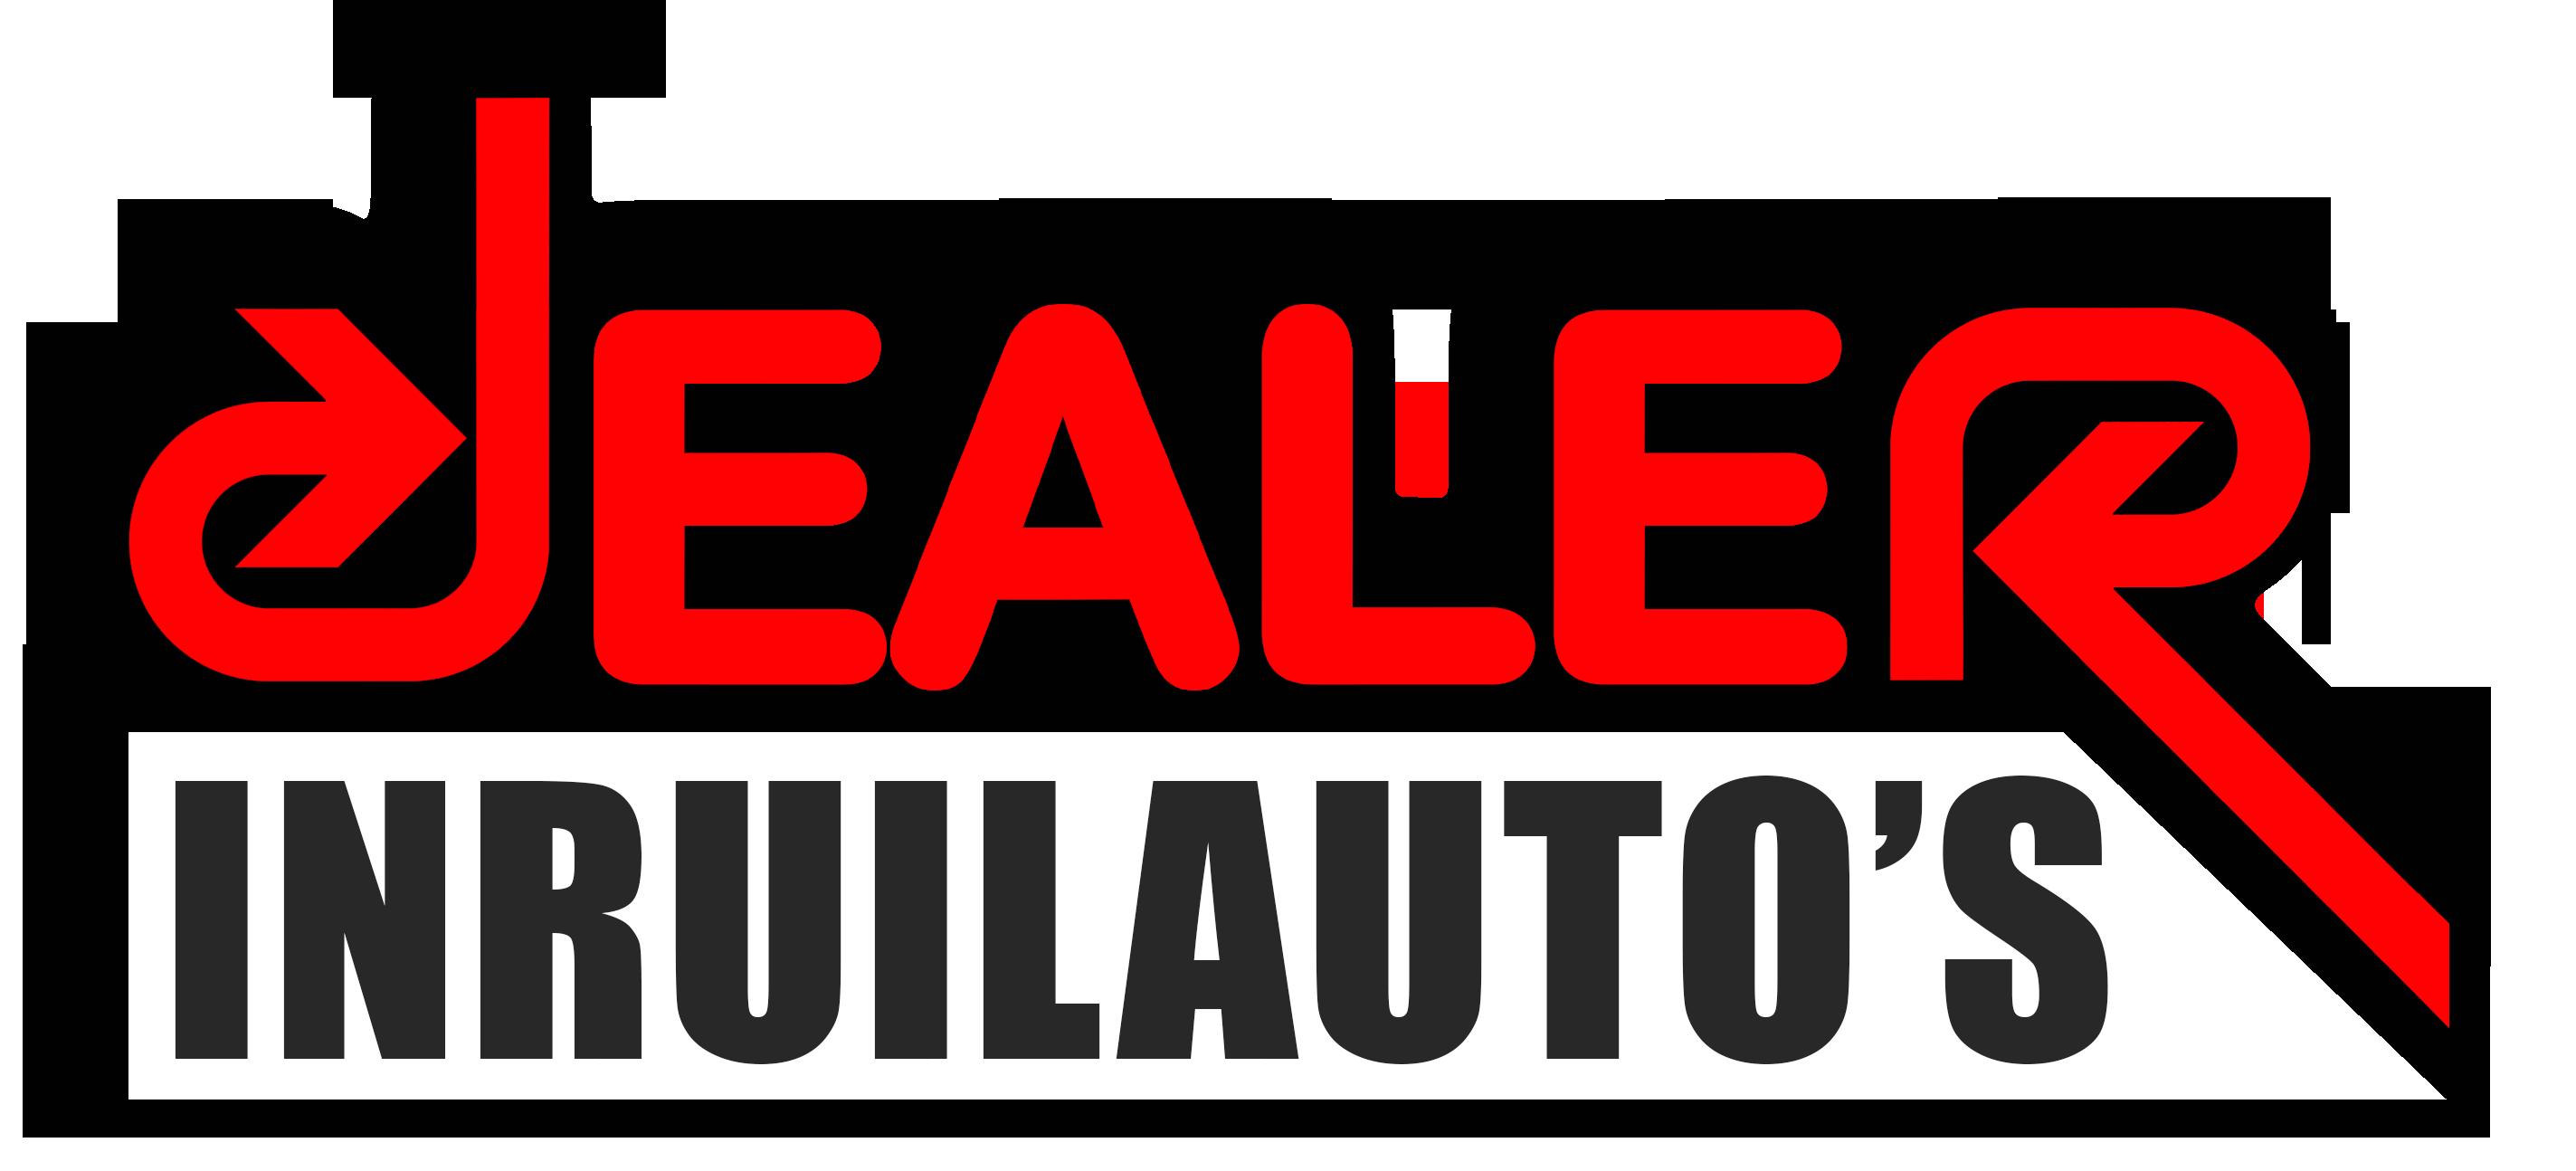 dealerinruilauto's.nl